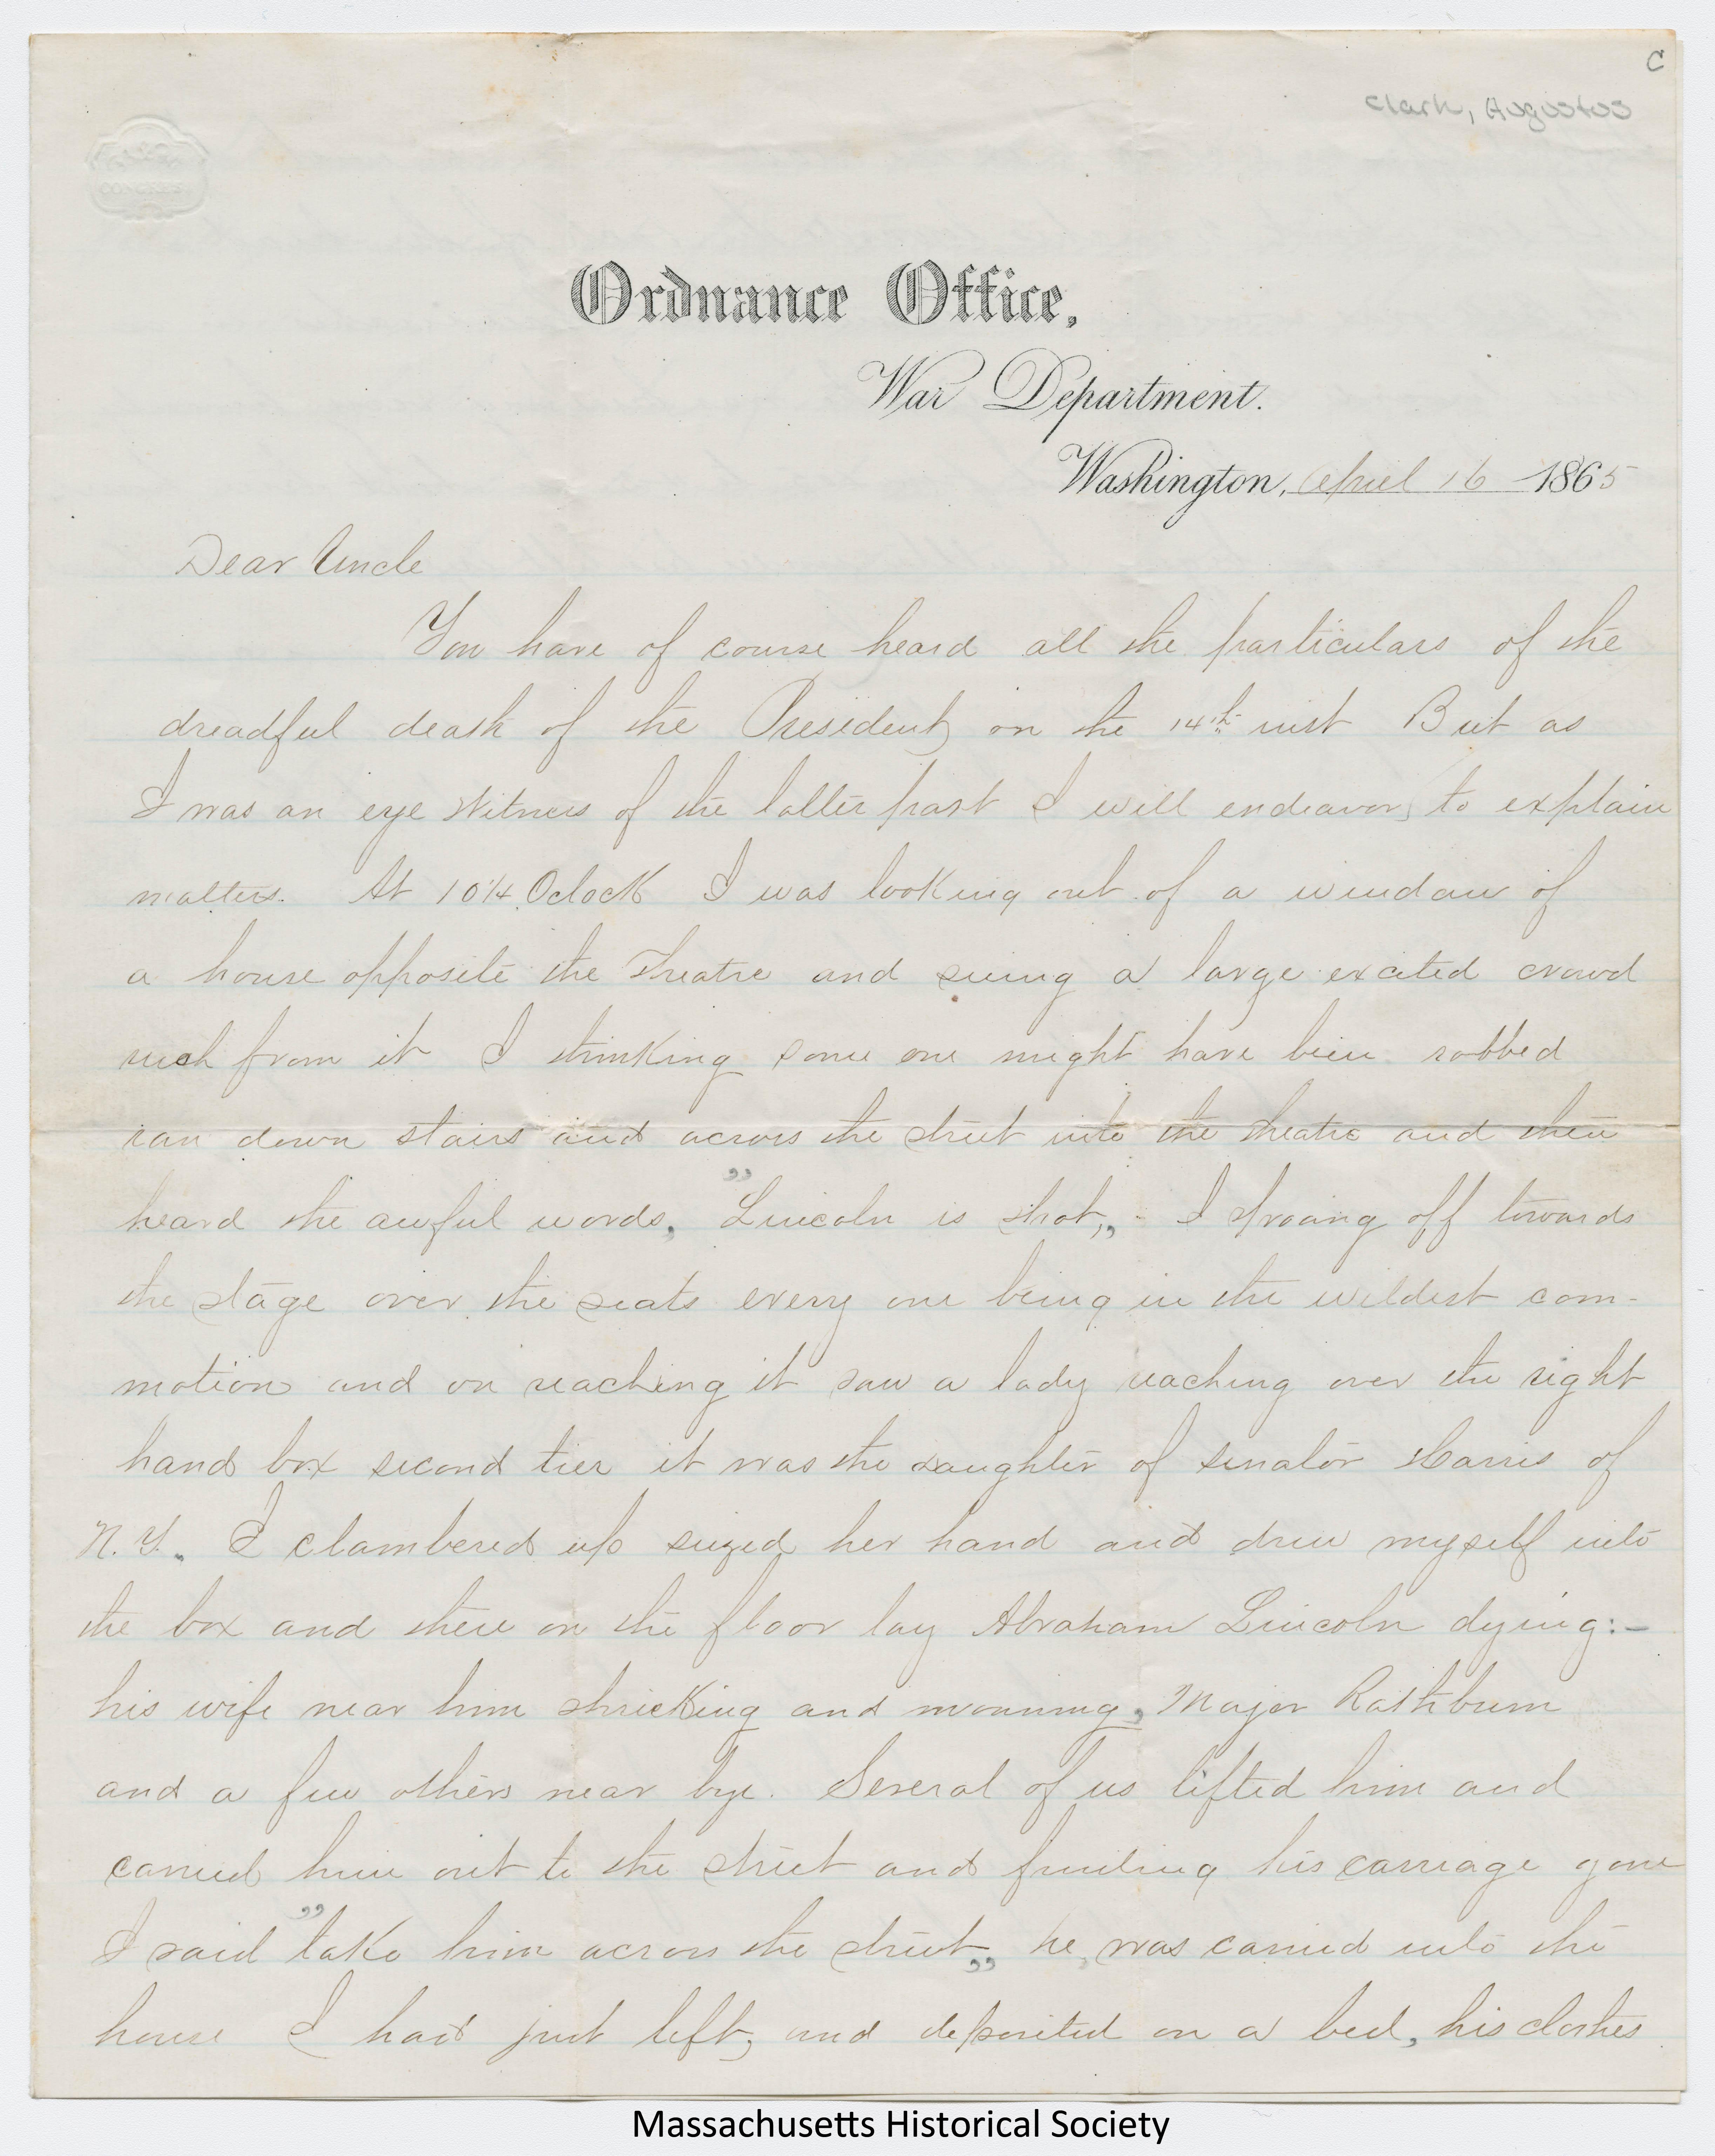 Letter from Augustus Clark to S. M. Allen, 16 April 1865